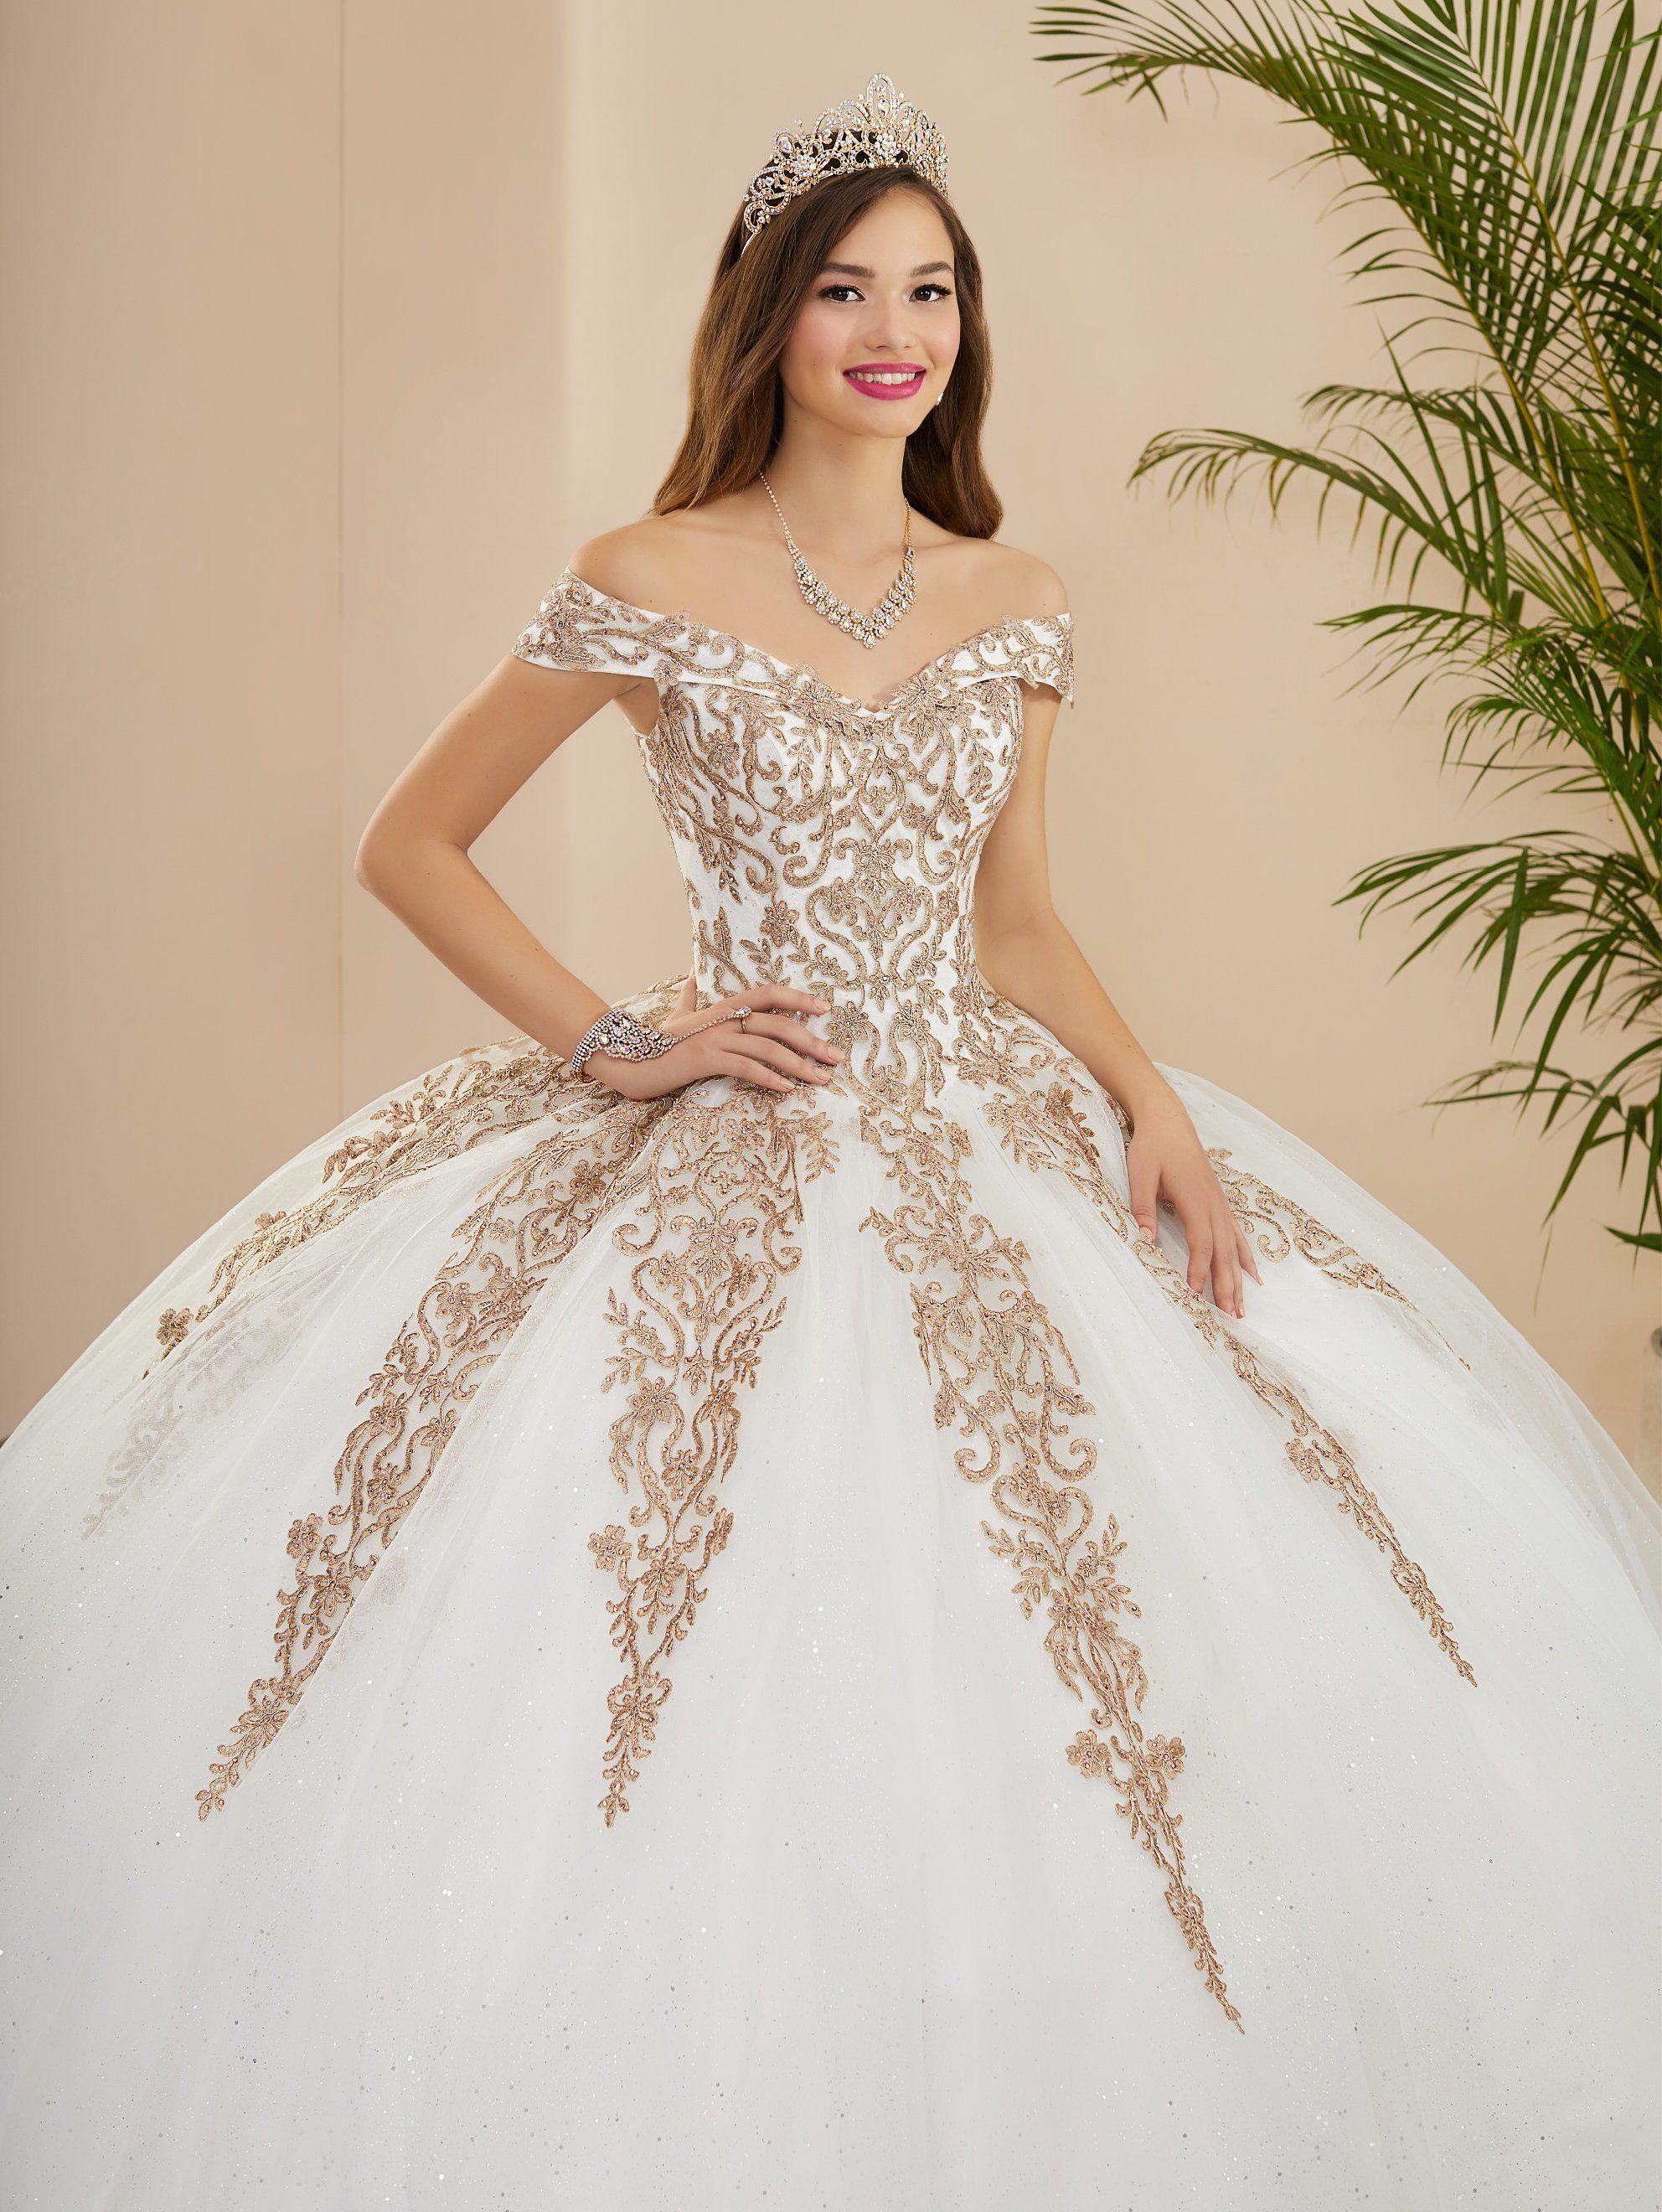 Applique Off Shoulder Quinceanera Dress By Fiesta Gowns 56400 Size 28 30 In 2021 Quinceanera Dresses Quince Dresses White Quinceanera Dresses [ 2640 x 1984 Pixel ]